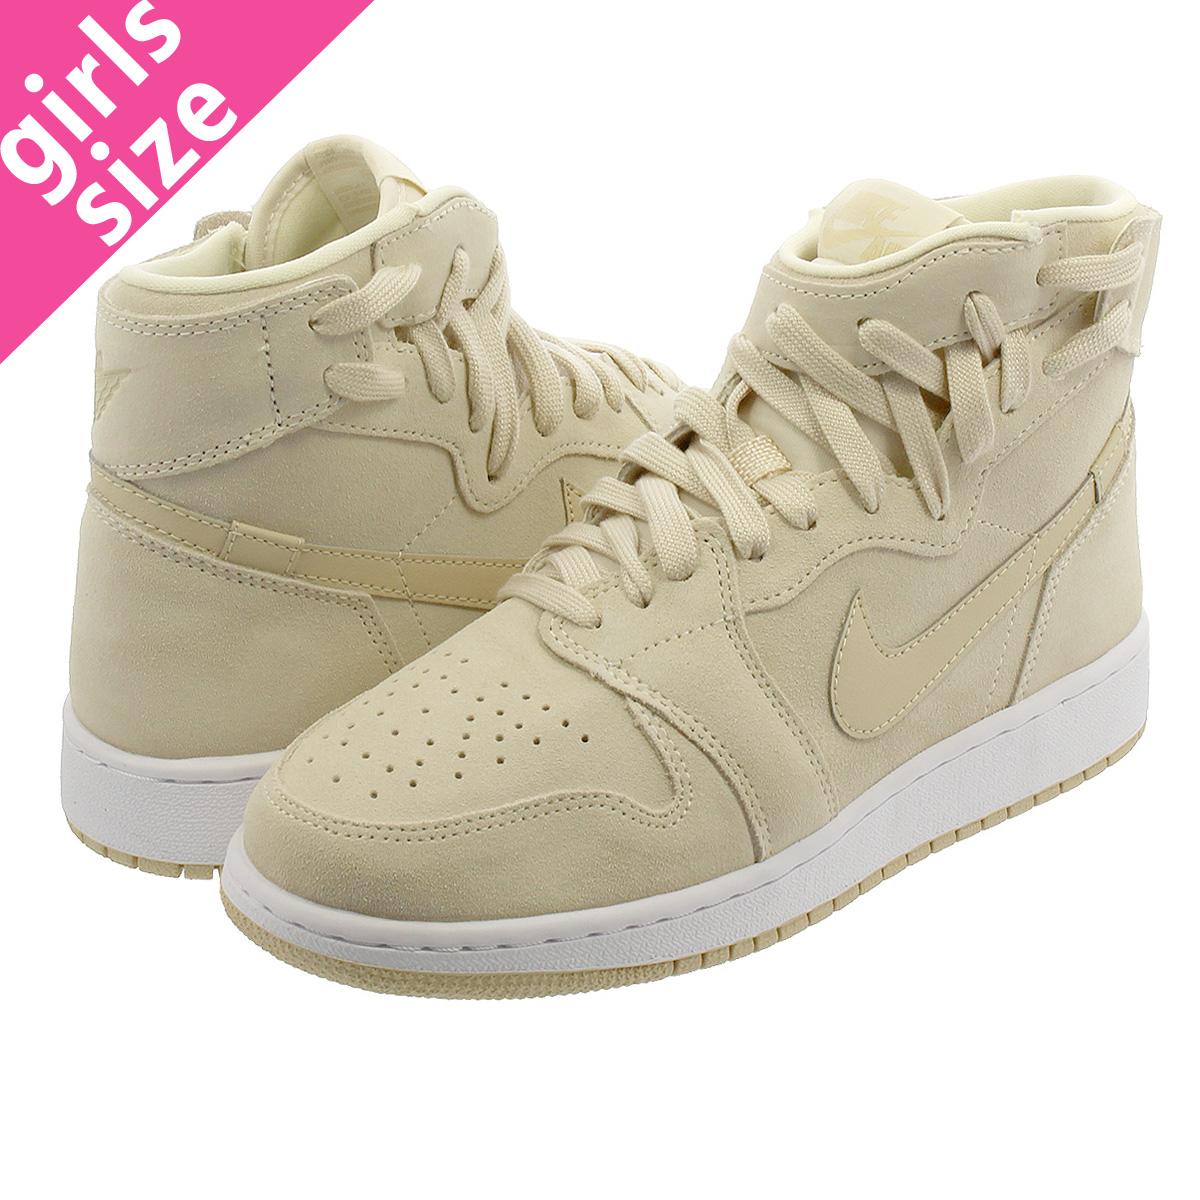 5caeb727ae5 NIKE WMNS AIR JORDAN 1 REBEL XX Nike women Air Jordan 1 level XX LIGHT CREAM  ...